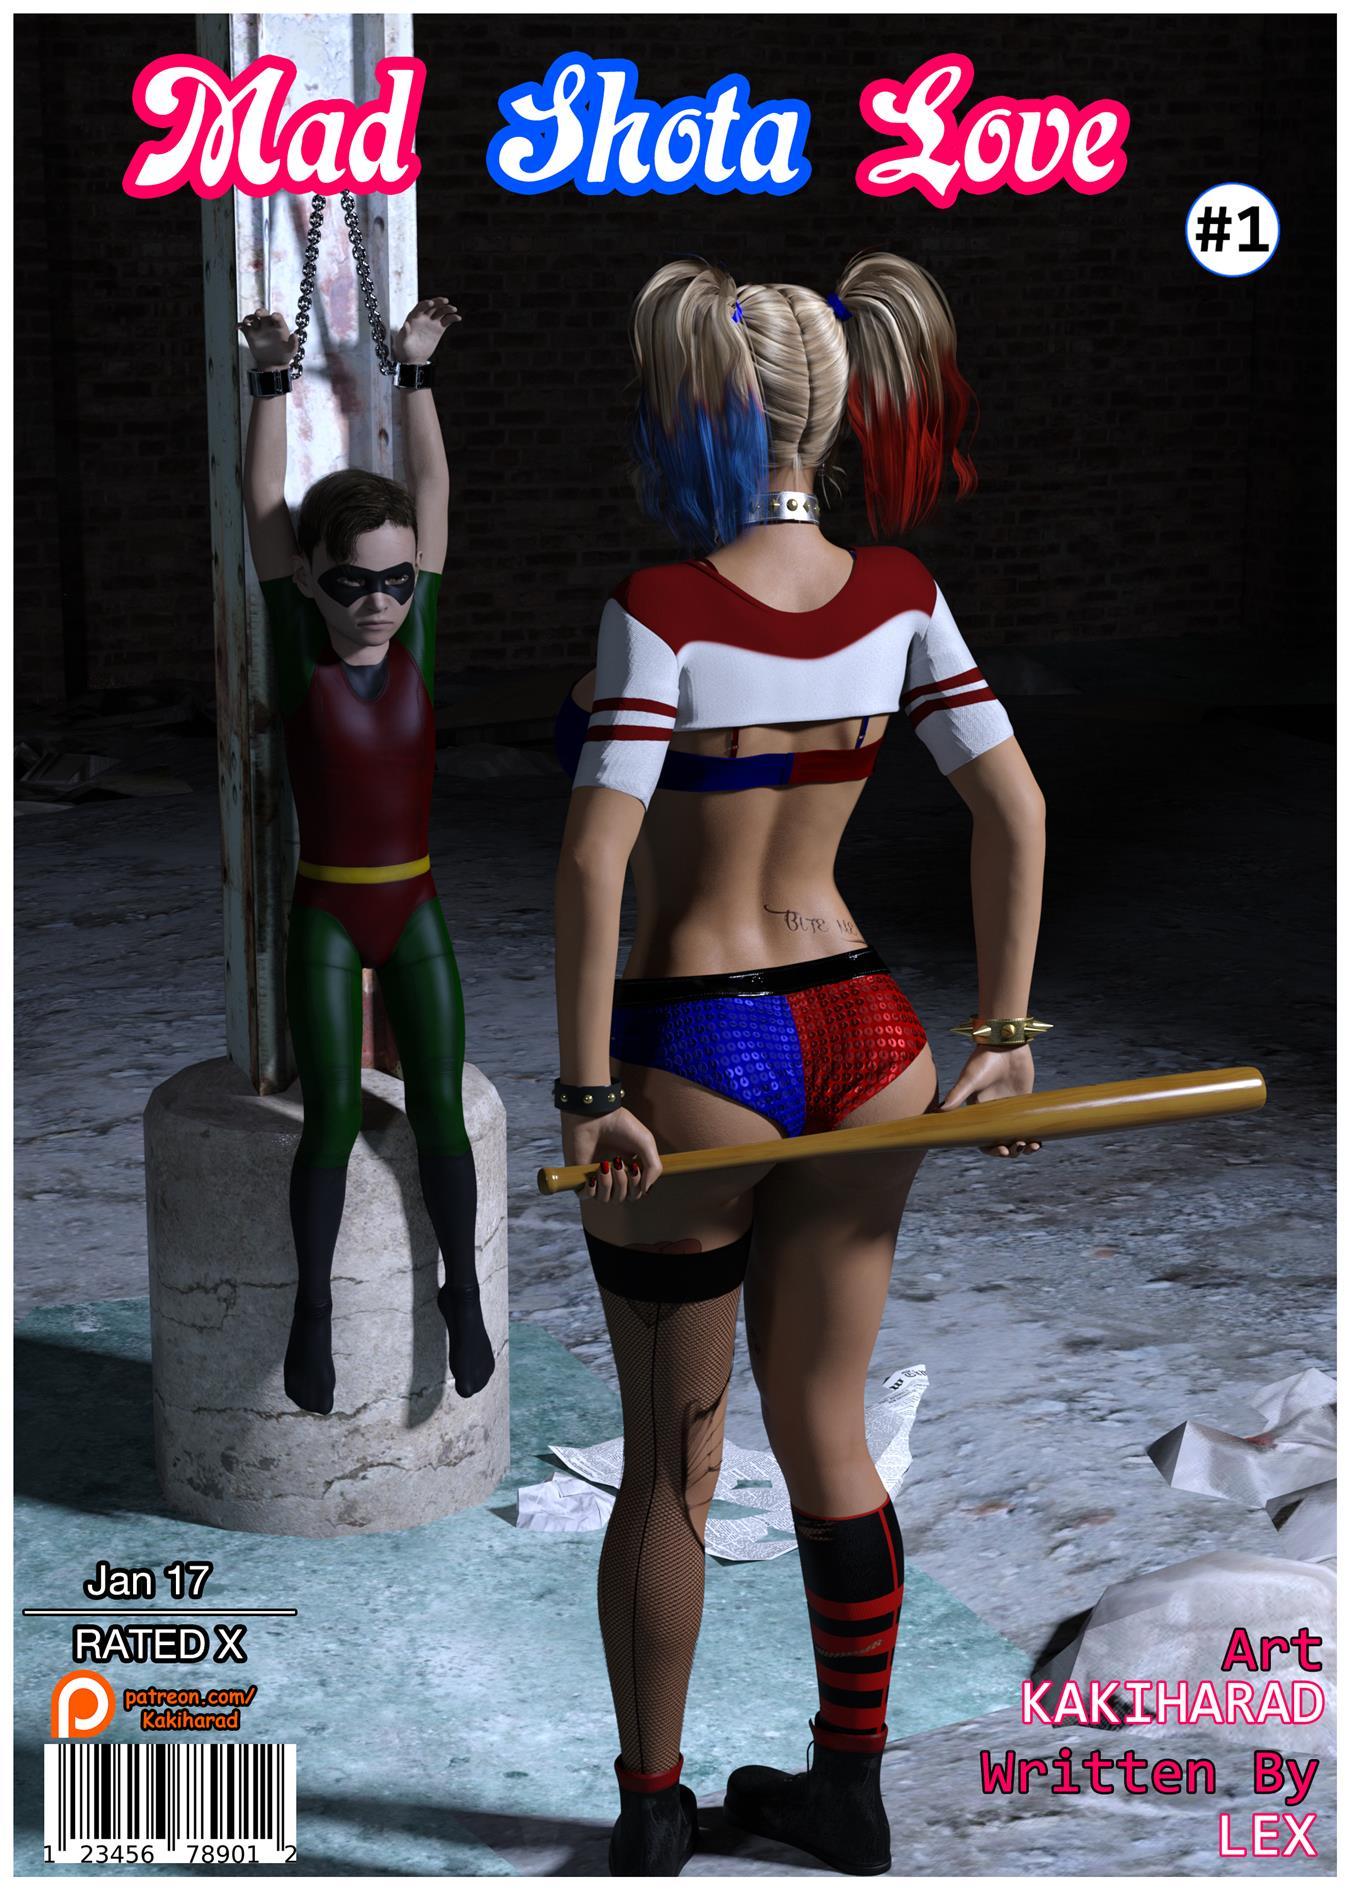 Mad Shota Love (Harley Quinn) - Foto 33